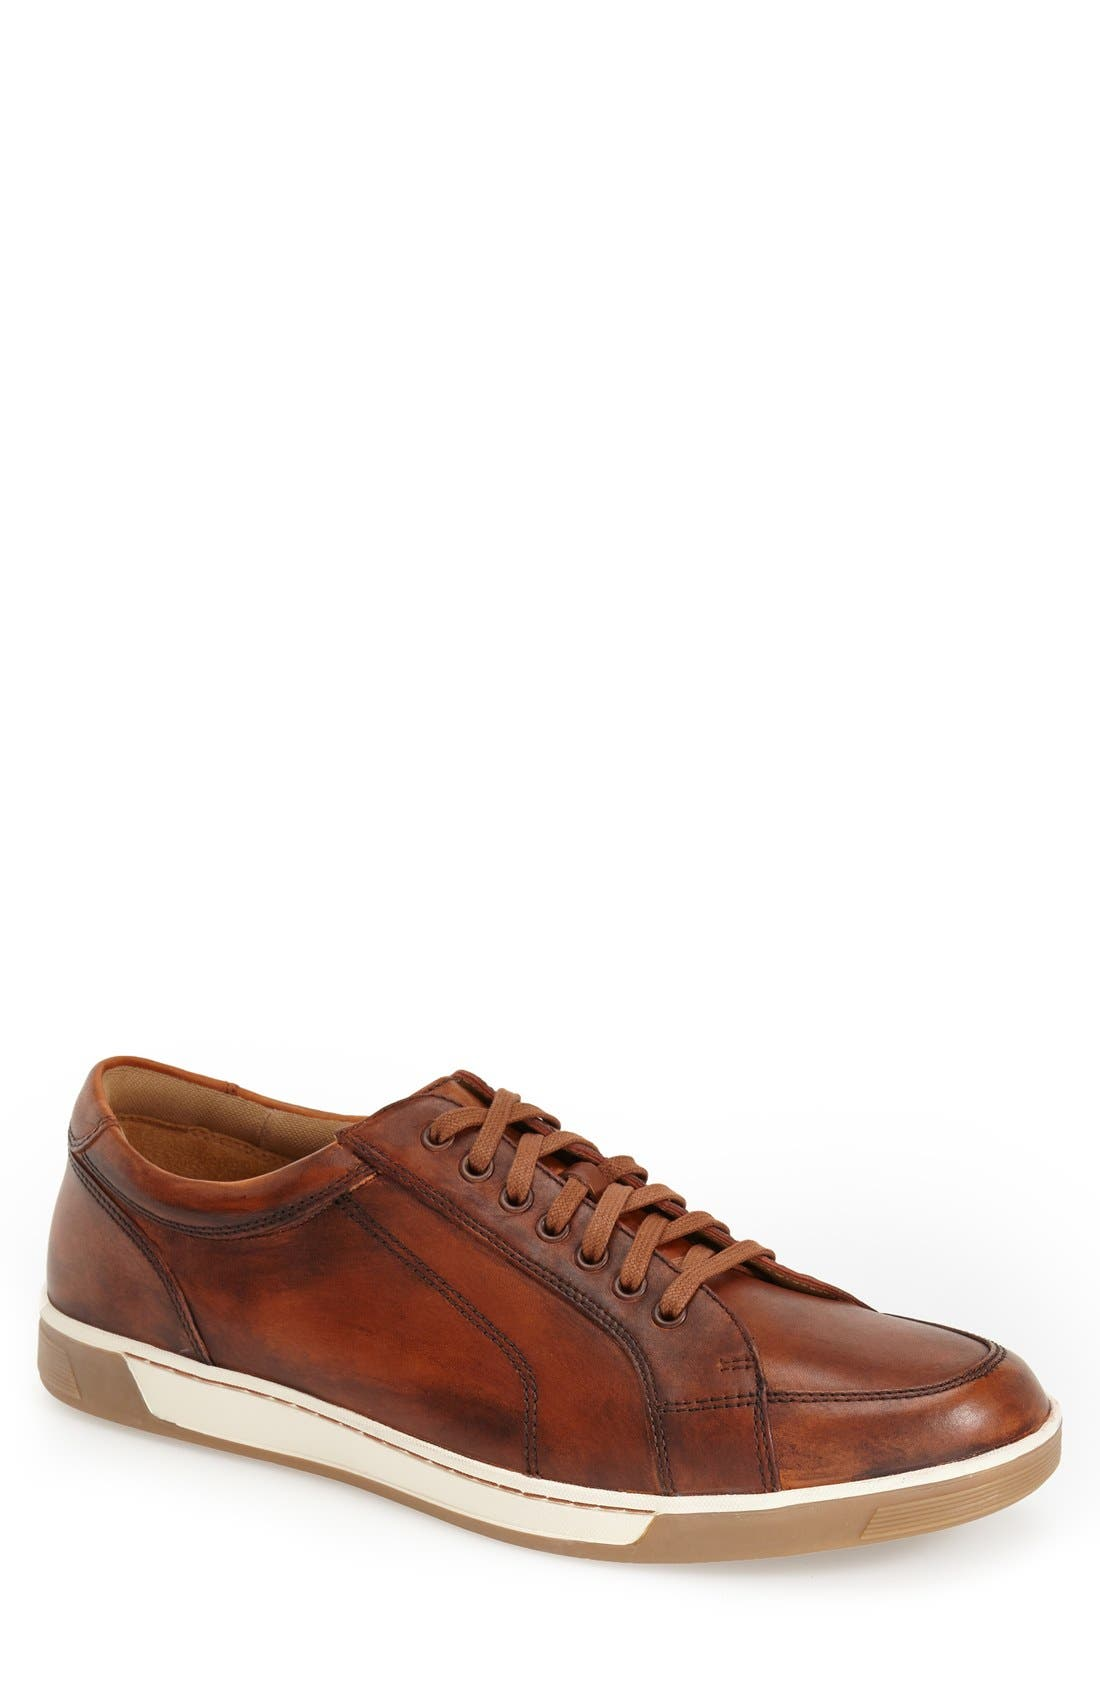 Alternate Image 1 Selected - Cole Haan 'Vartan Sport Oxford' Sneaker (Men)